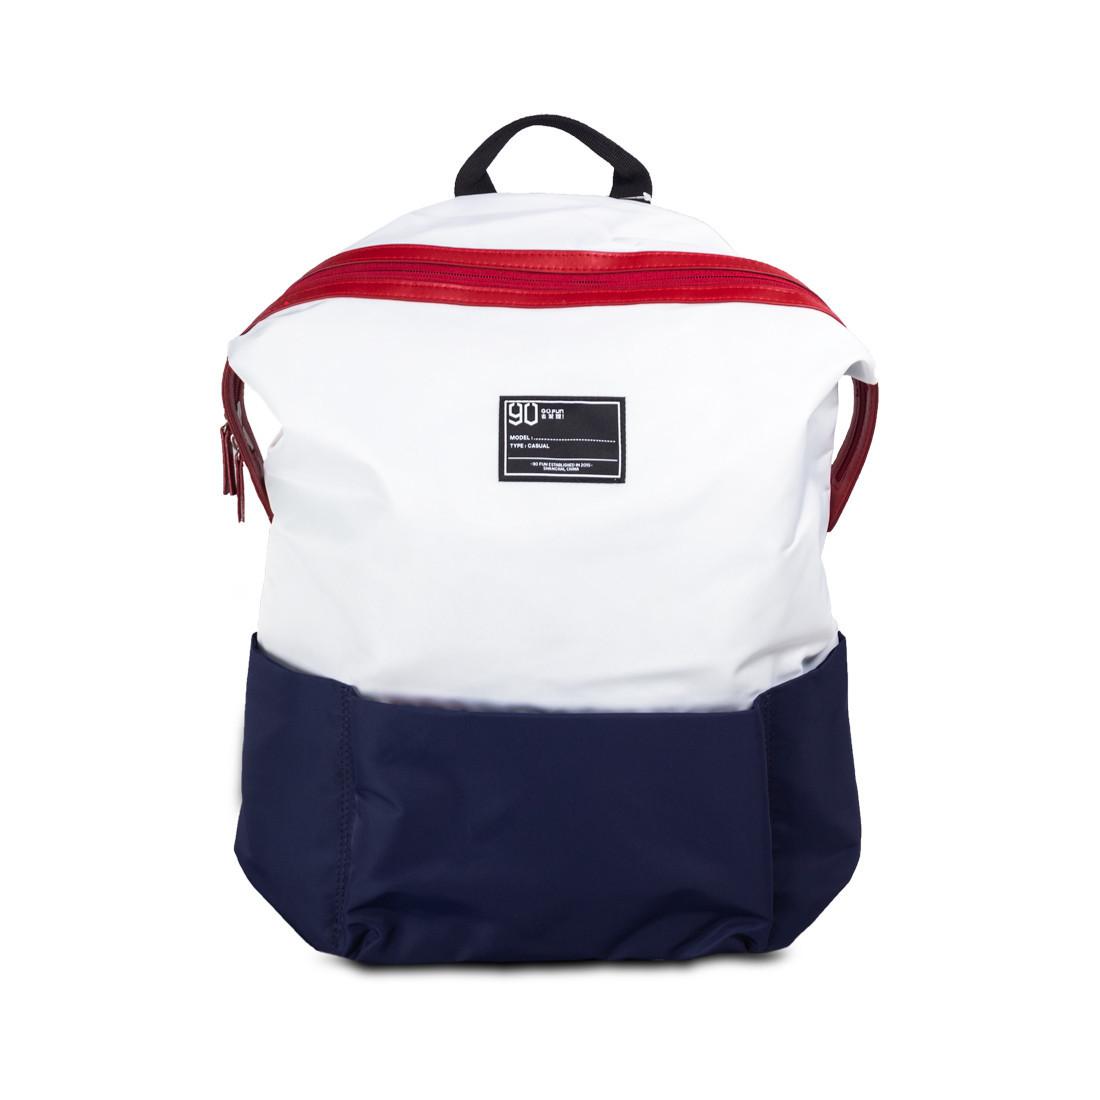 Рюкзак, Xiaomi 90 Points, Lecturer Leisure Backpack  Бело-Синий (6971732586039)